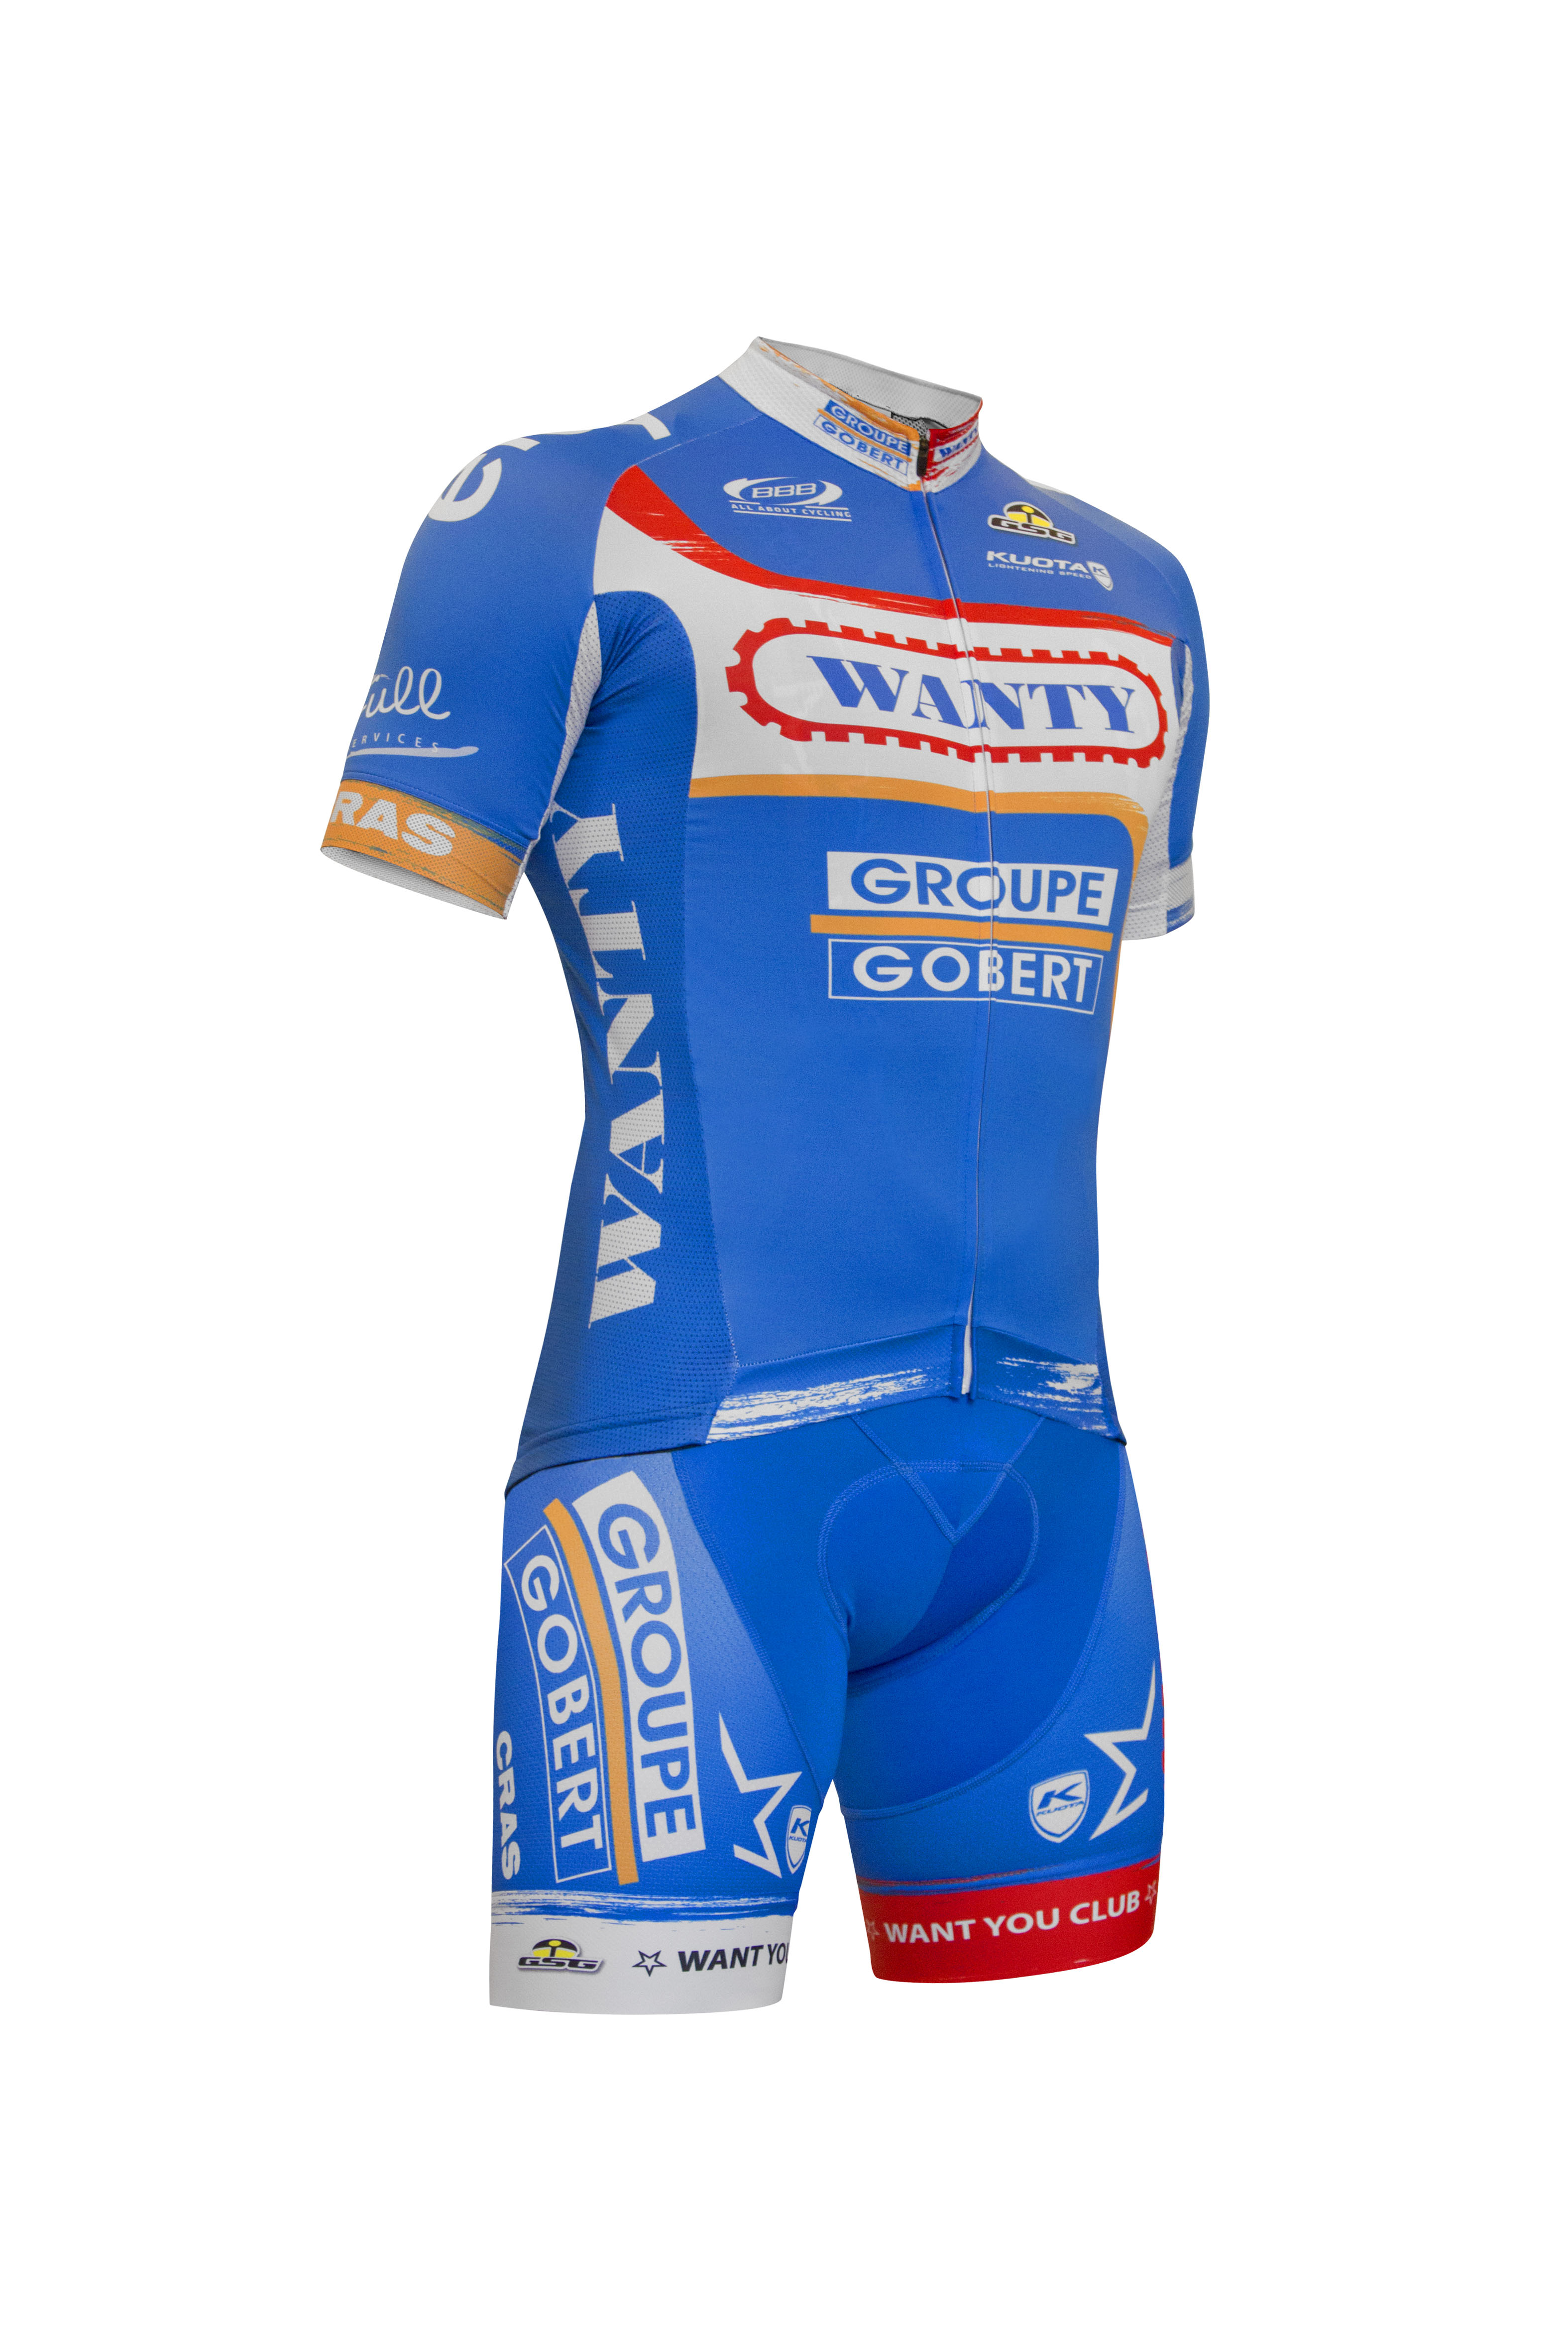 GSG sponsor Wanty-Groupe Gobert team